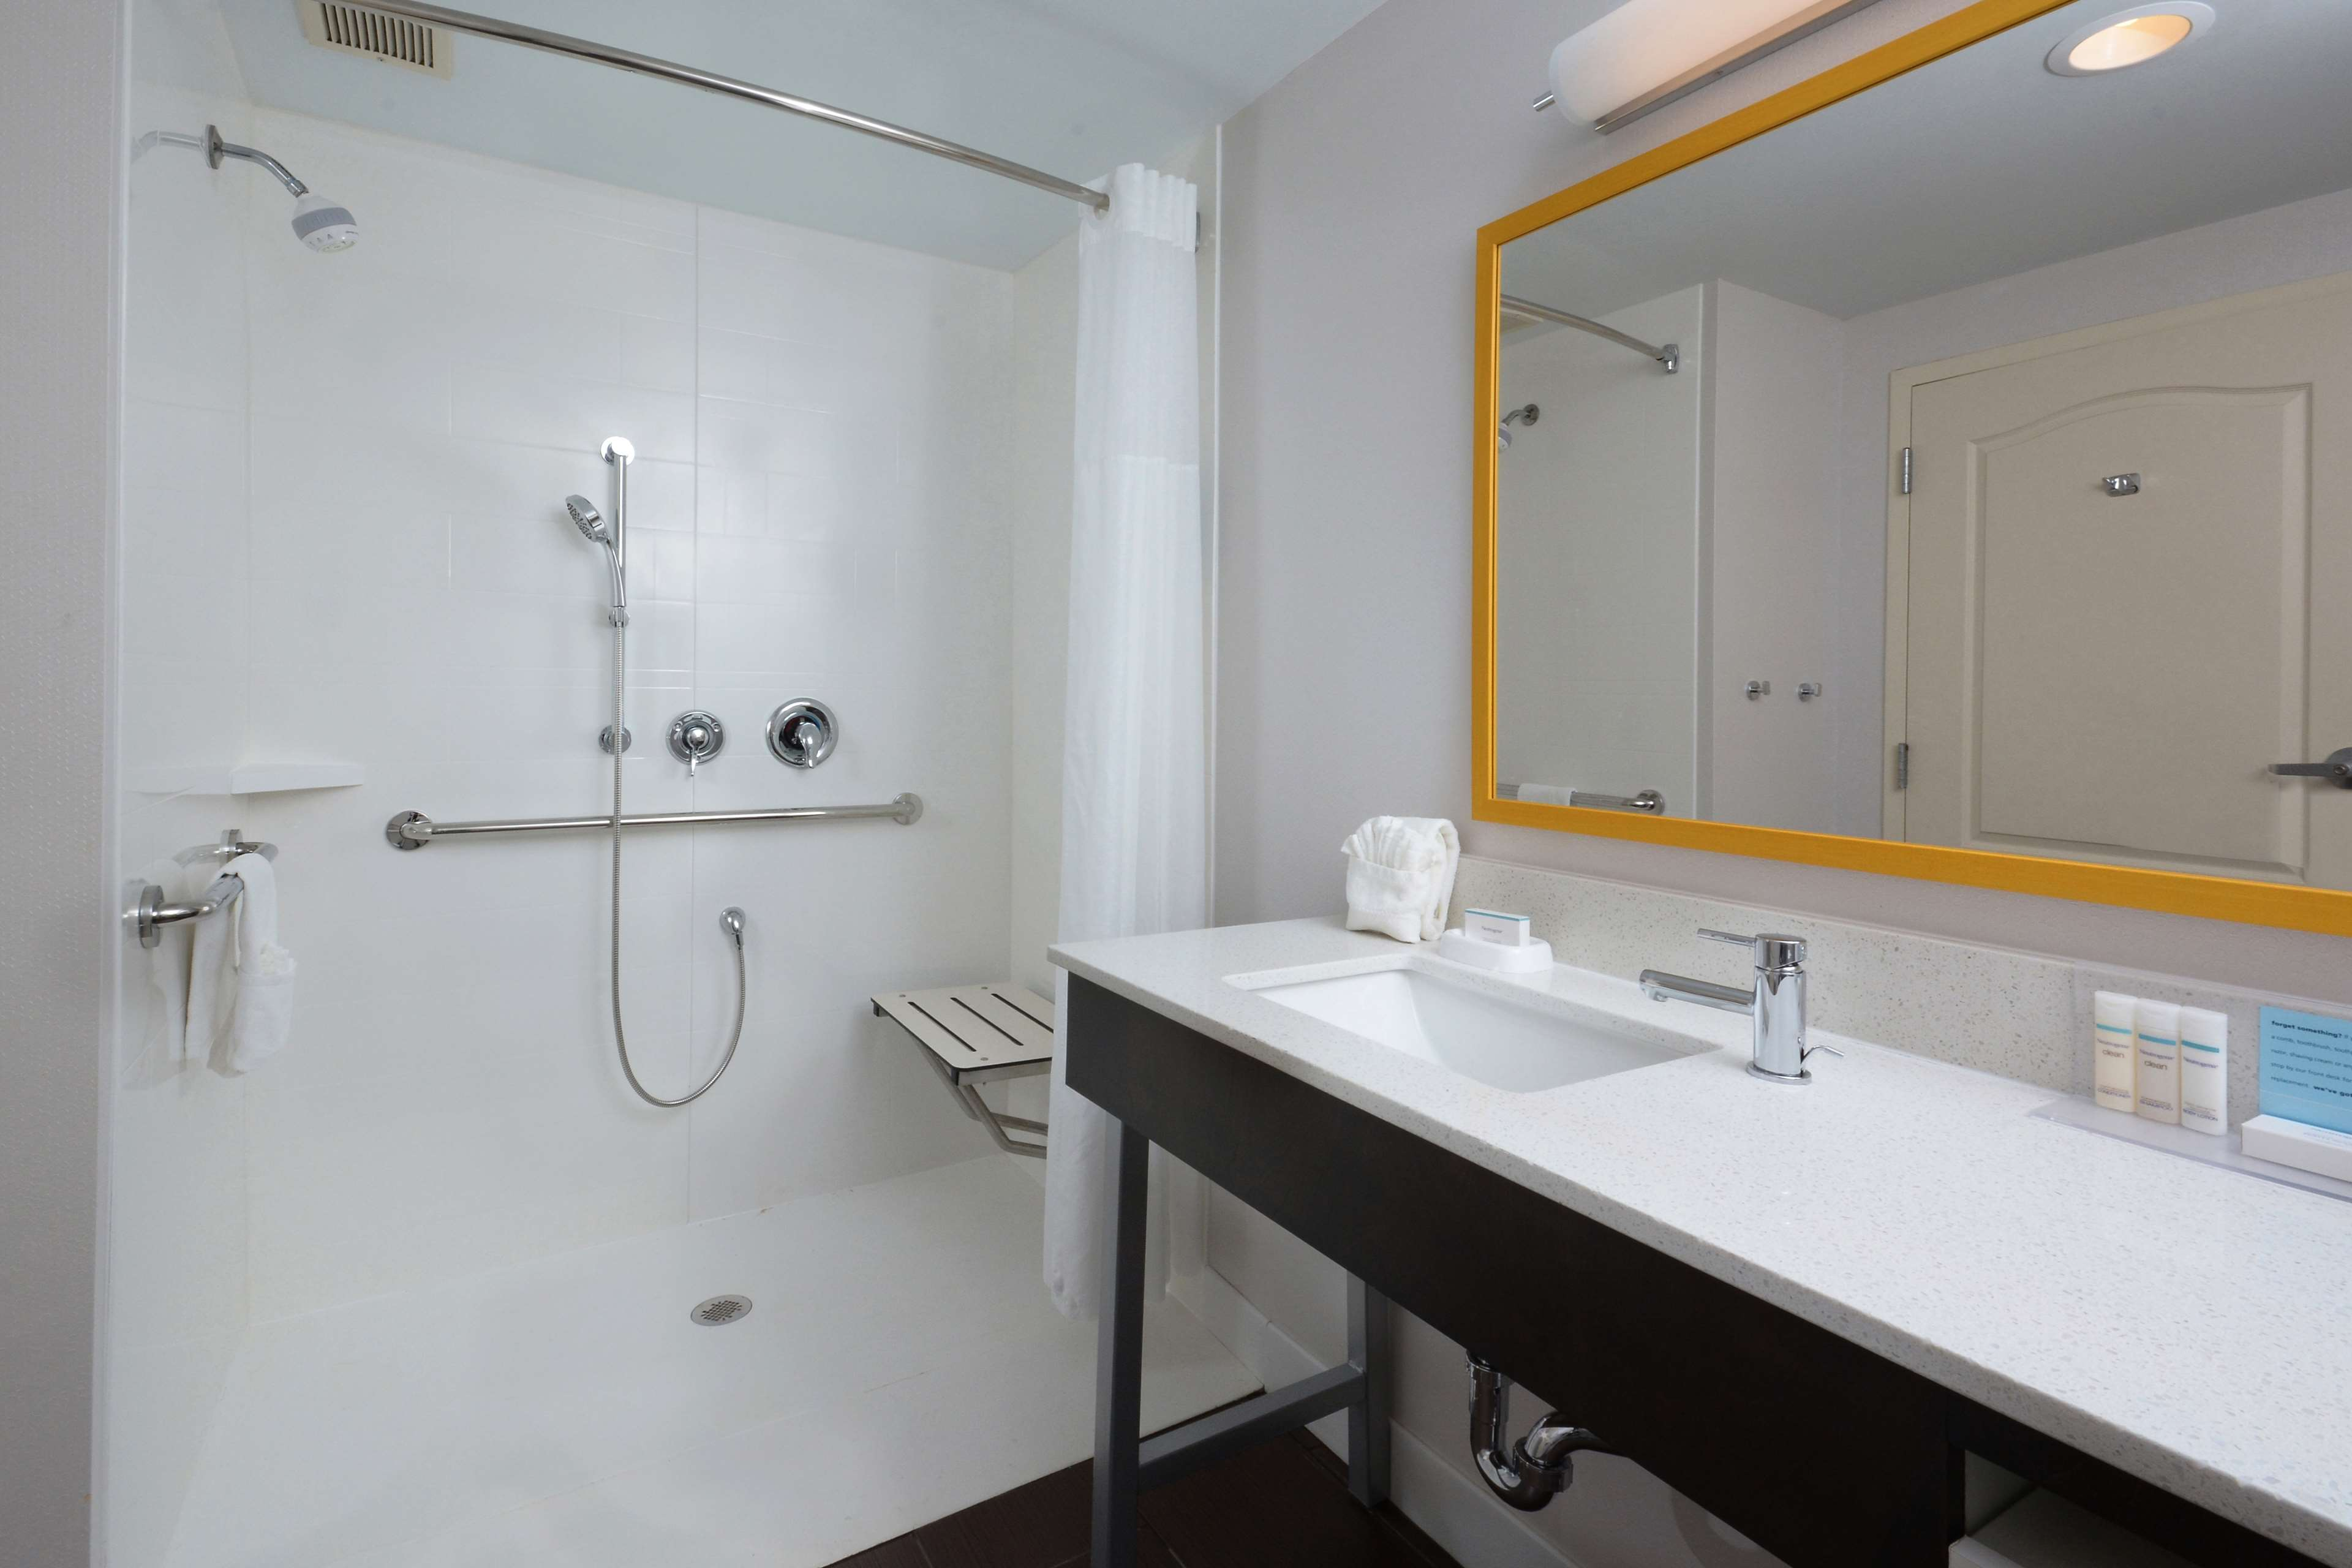 Hampton Inn & Suites Greenville/Spartanburg I-85 image 40